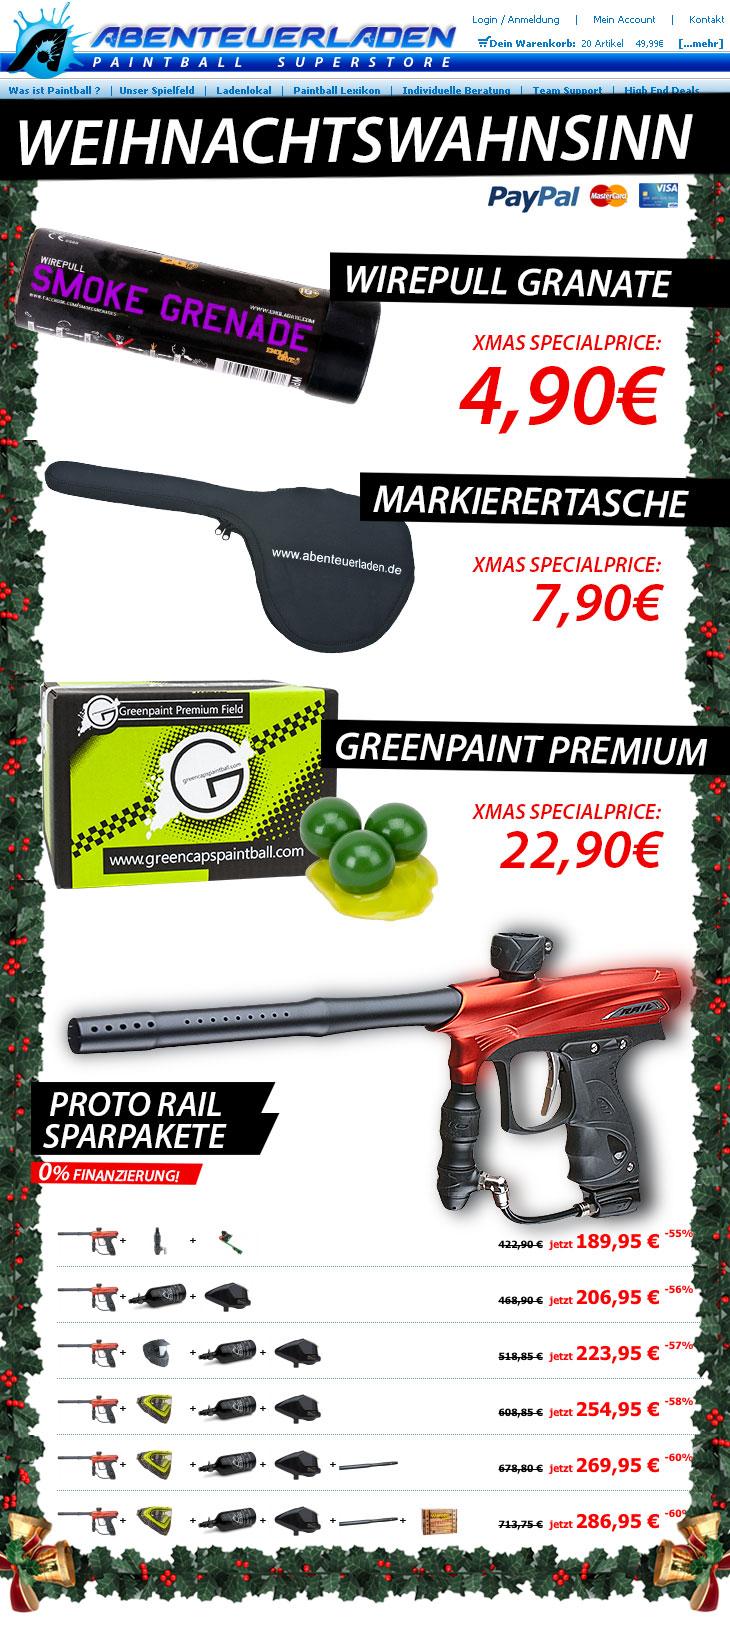 Paintball Bild https://www.abenteuerladen.de/newsletter/09-12-2016.jpg